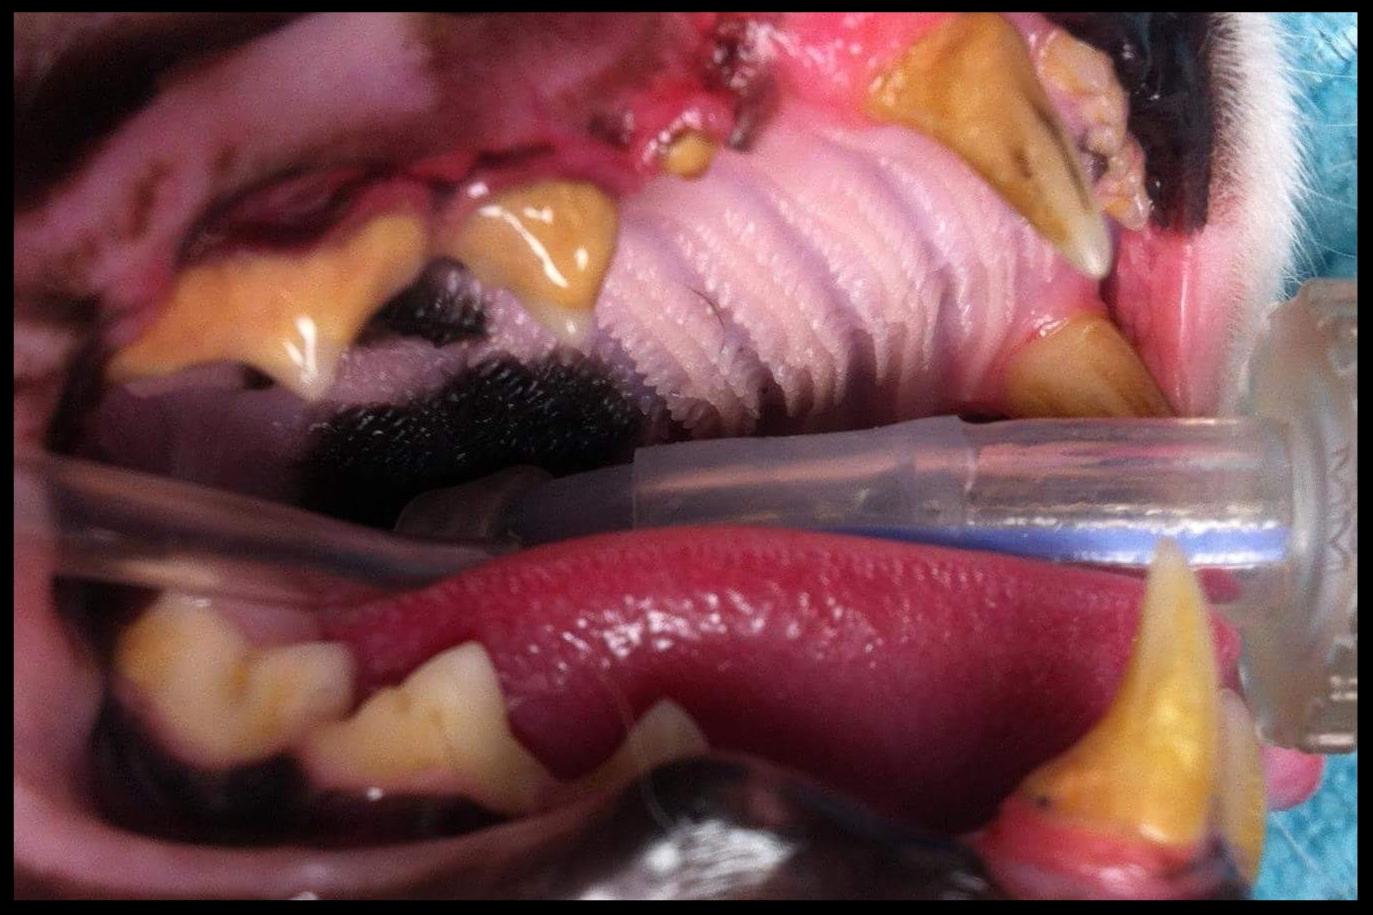 Before Dental